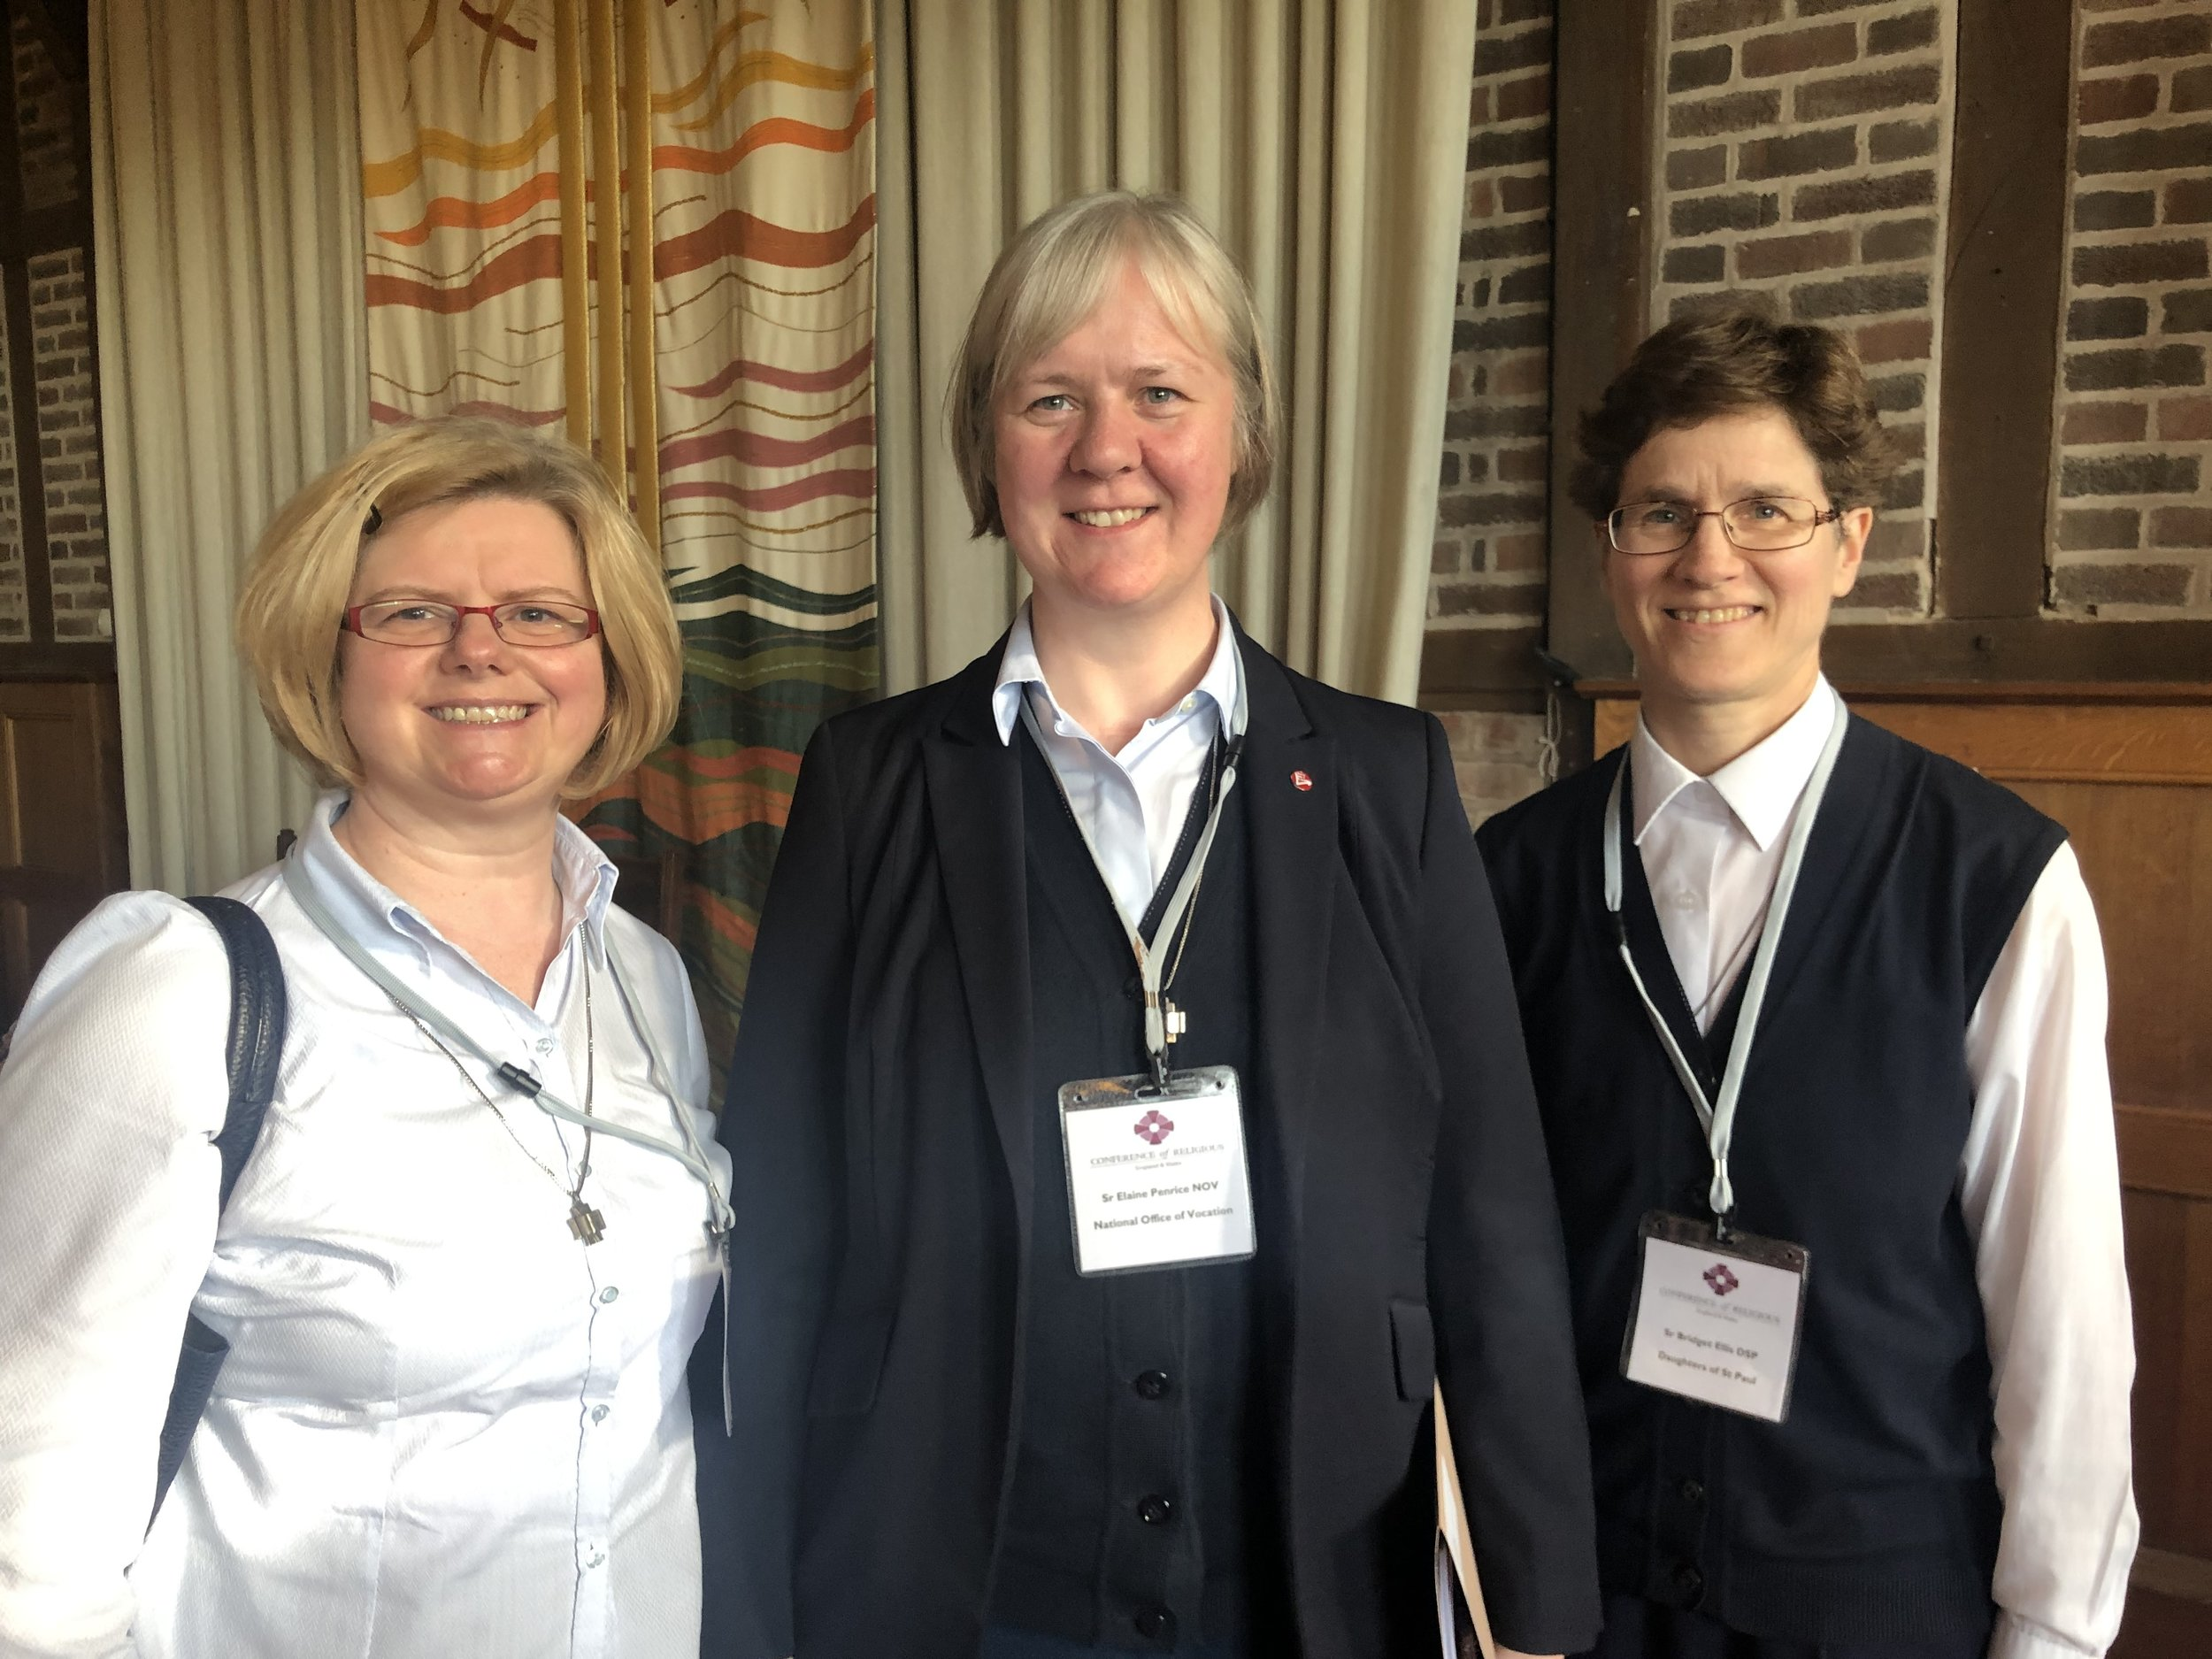 Daughters of St Paul at the CoR AGM: l to r: Sr Angela Grant, Sr Elaine Penrice, Sr Bridget Ellis